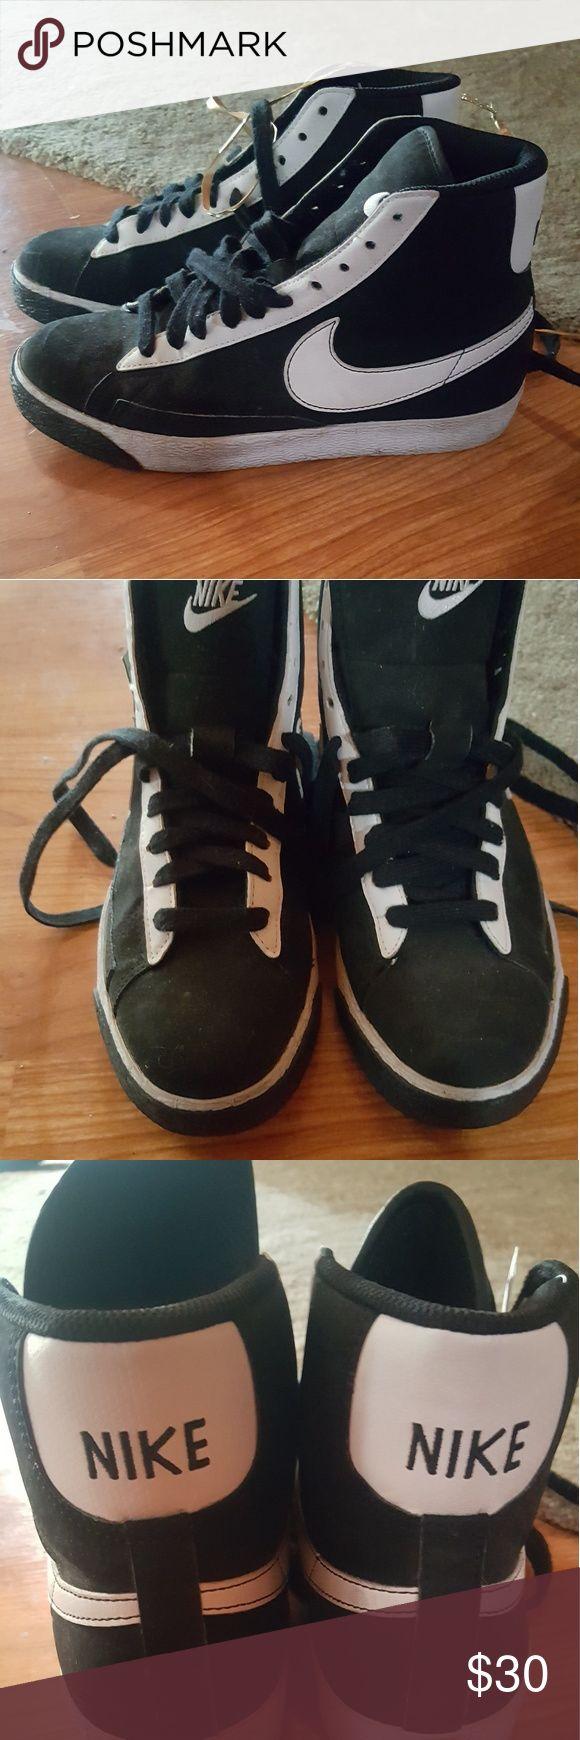 Nike hi-tops Black old school Nike hi-tops. Youth 4.5 / Women's 6 Nike Shoes Athletic Shoes